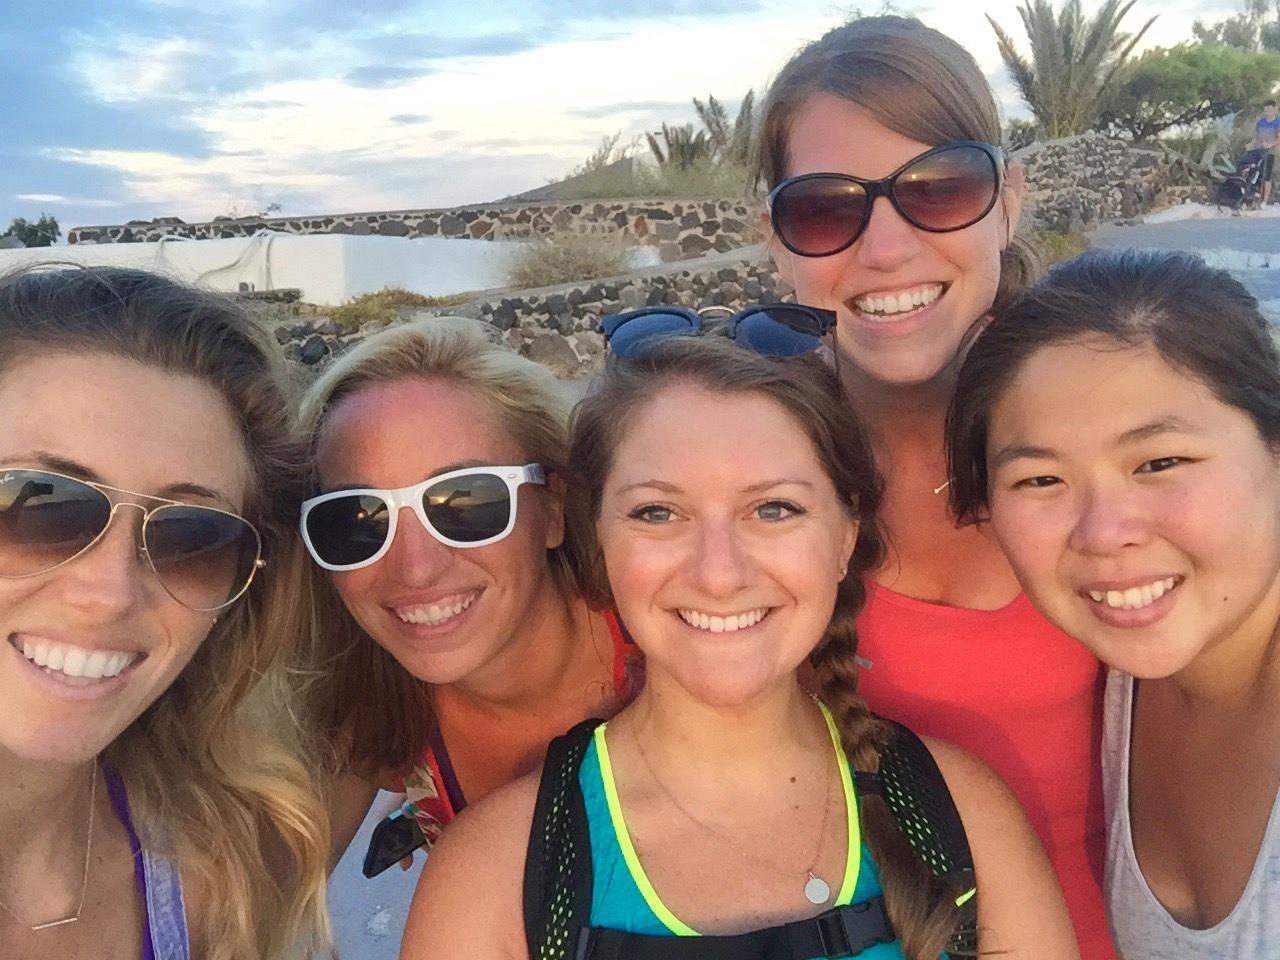 Jenna and friends hiking in Santorini, Greece